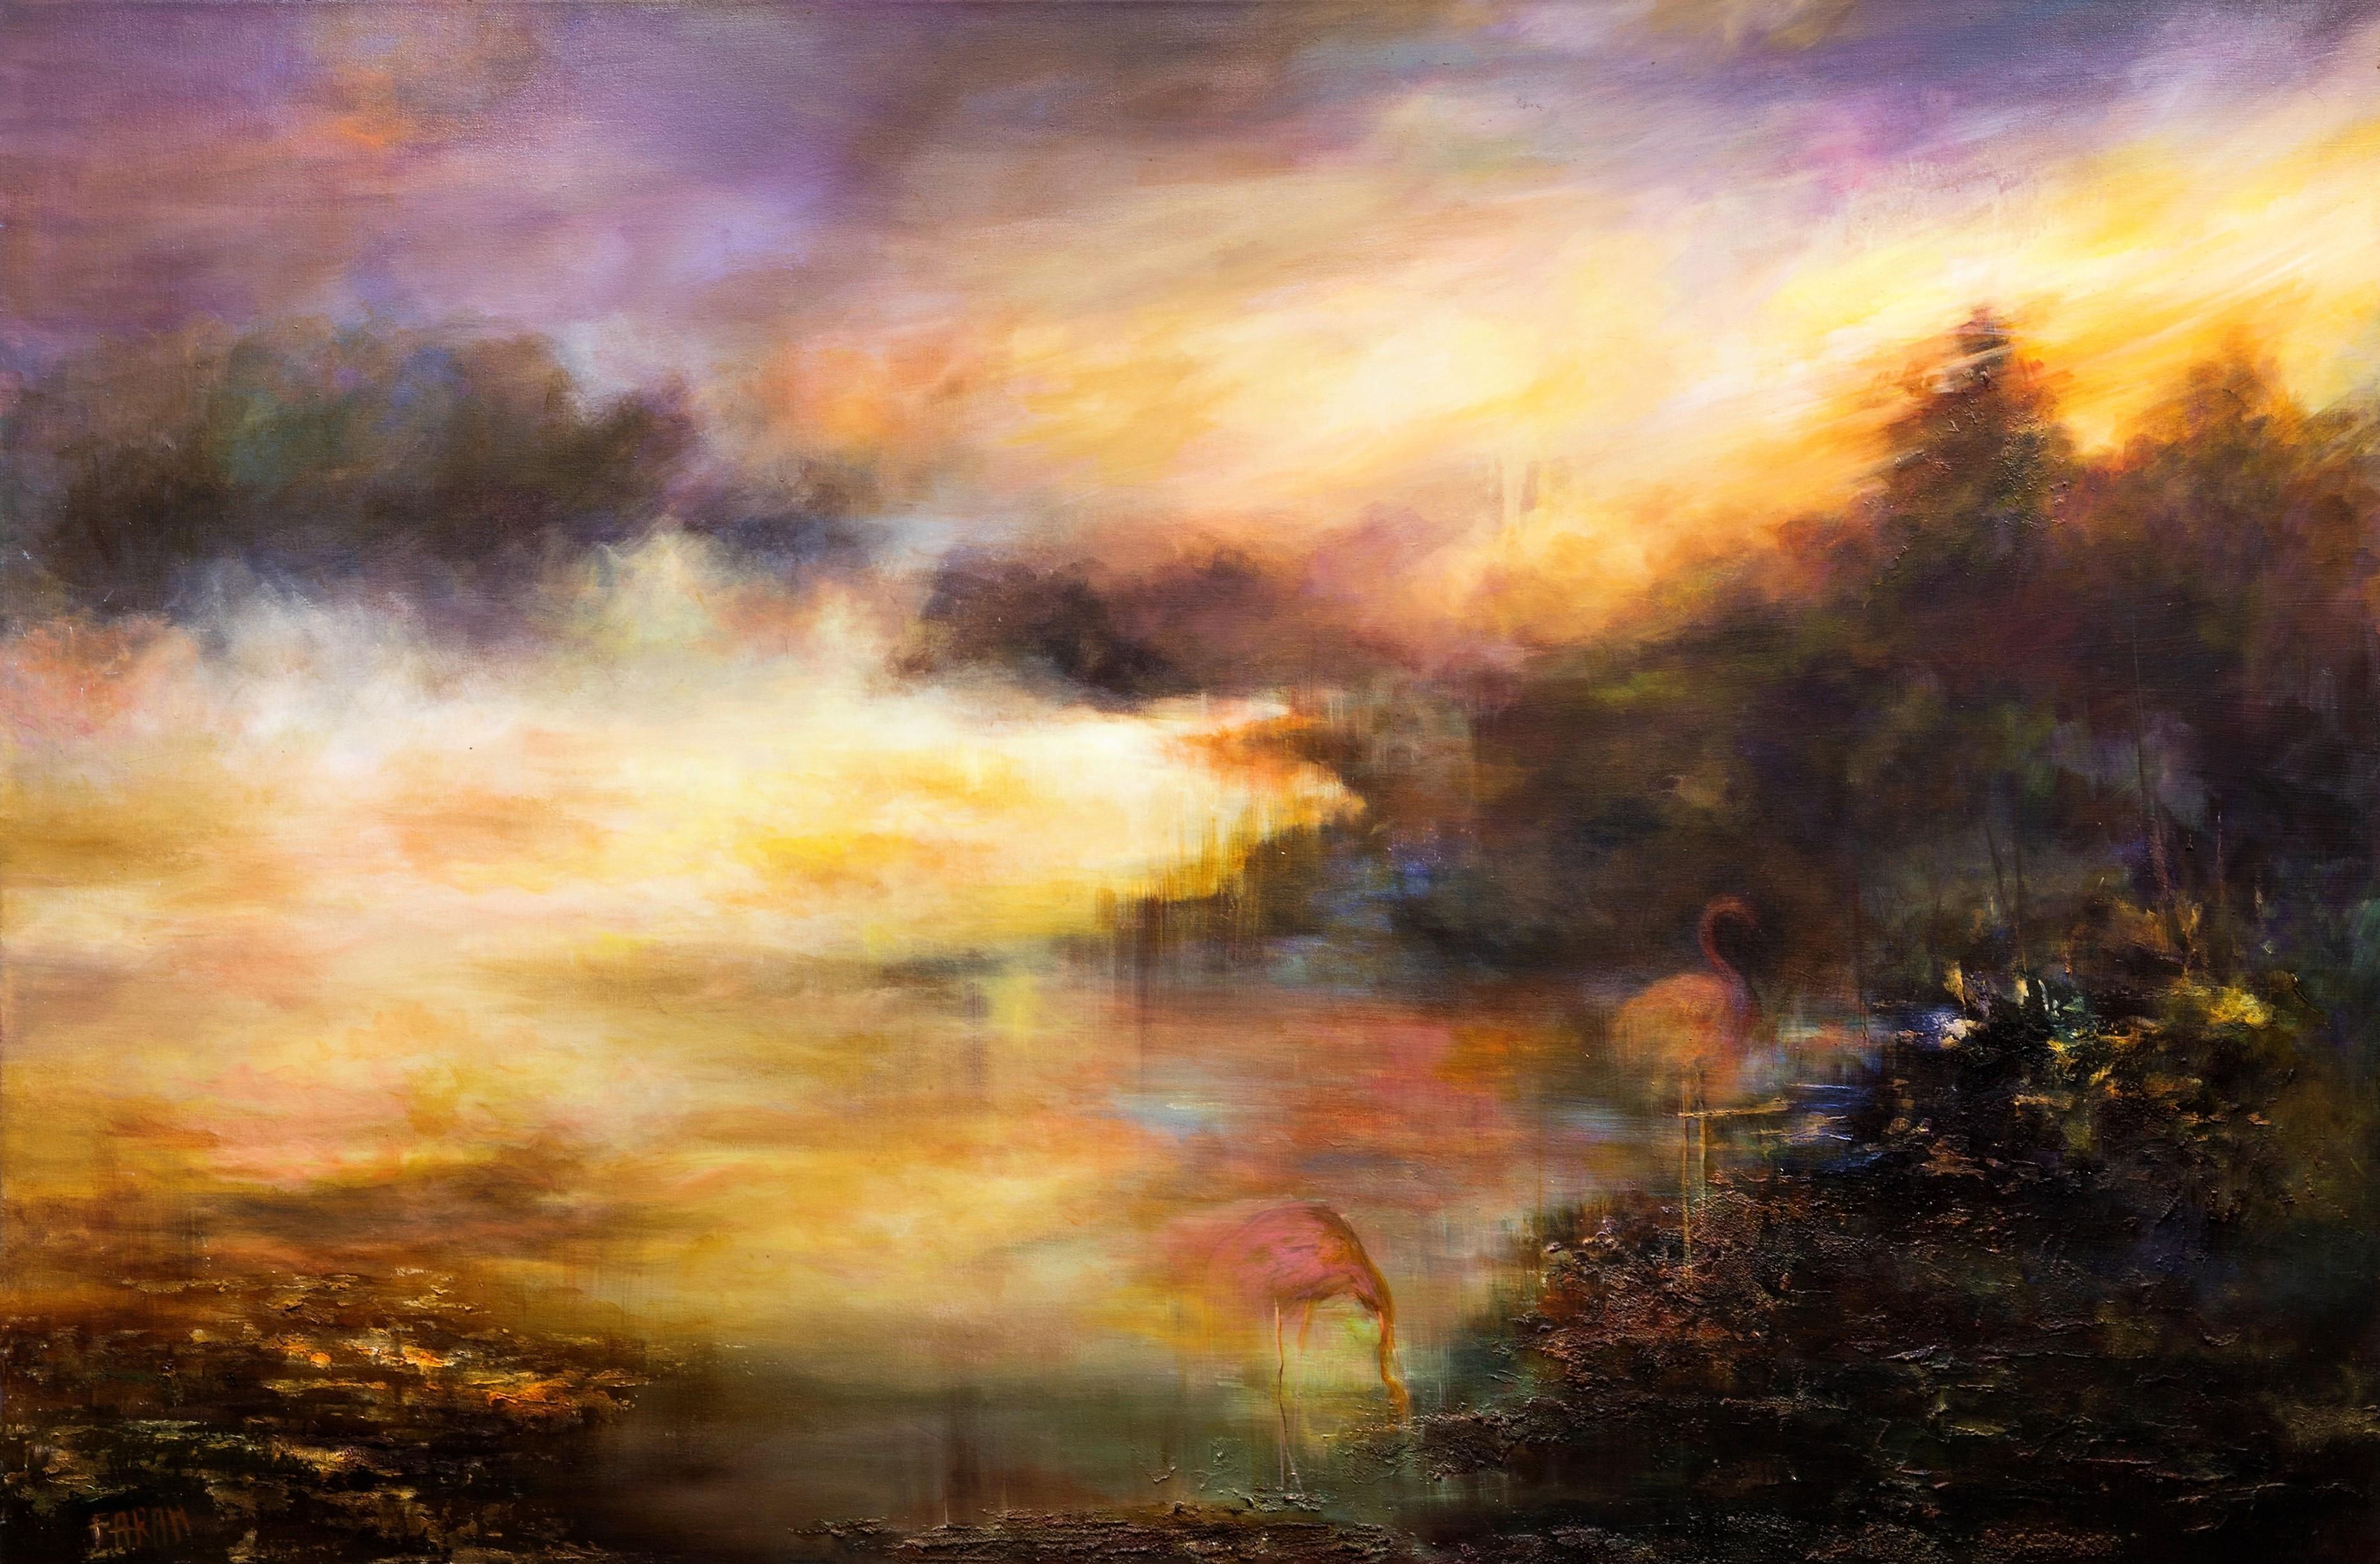 Farahnaz Samari Mist Original Acrylic Painting 36x52